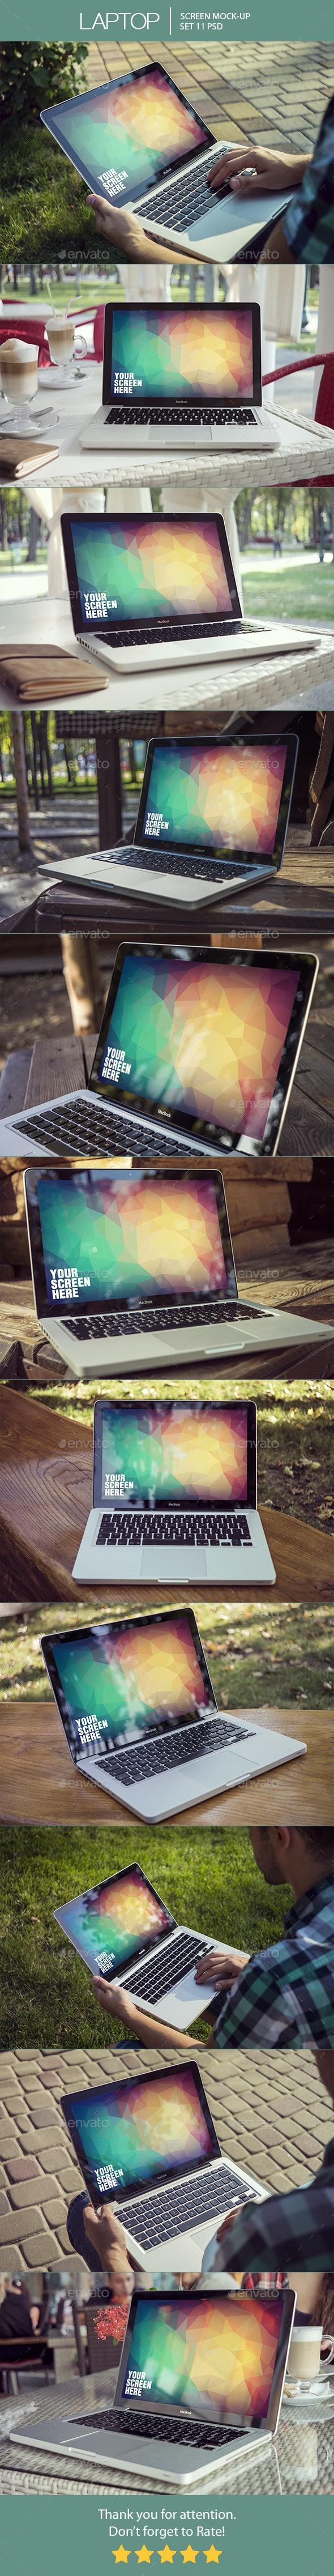 Laptop Screen Mockup - Laptop Displays